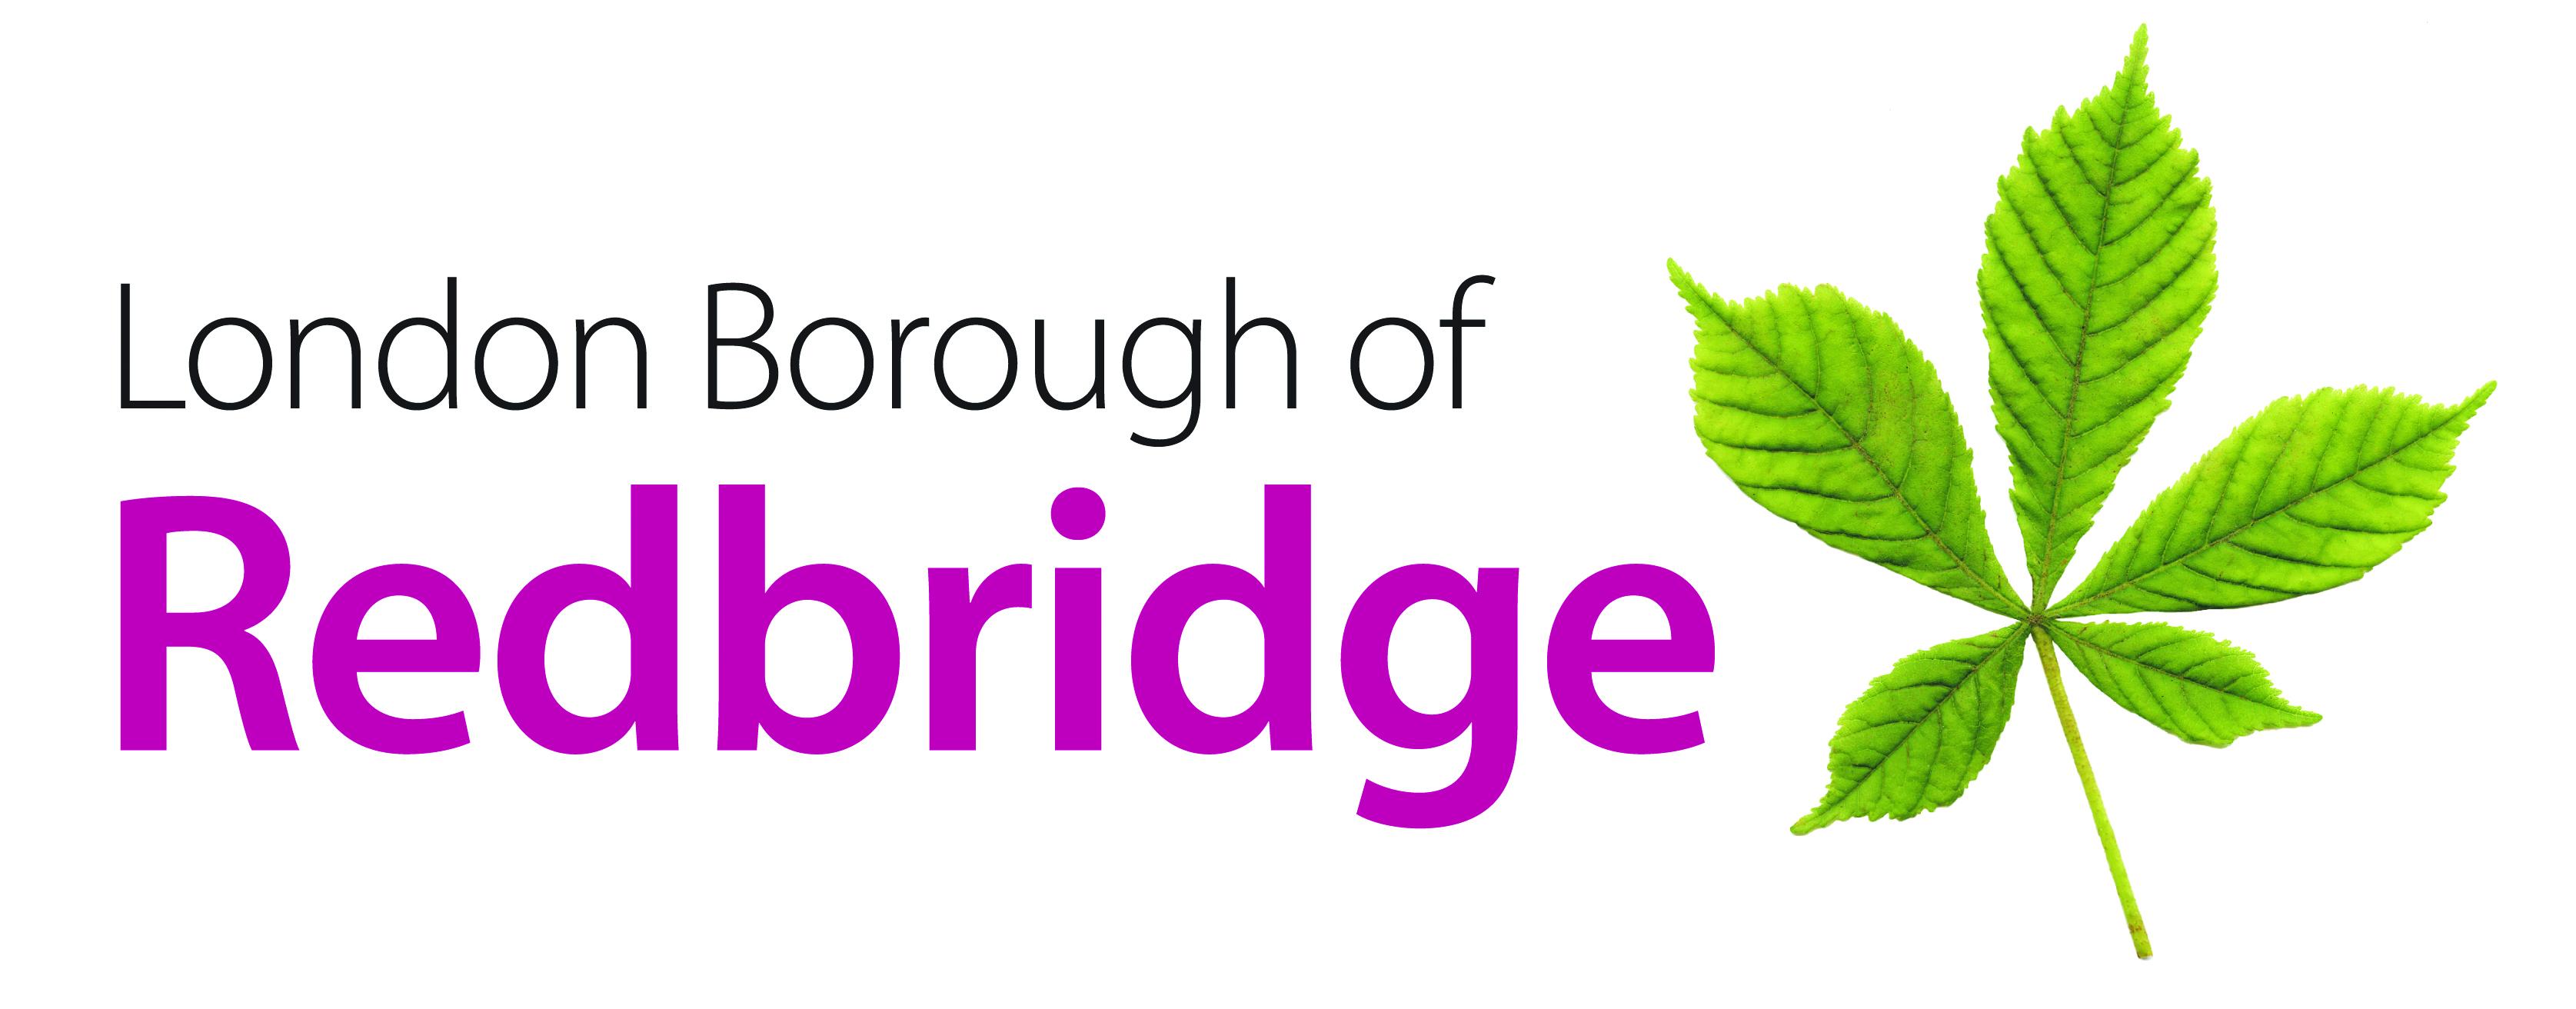 LB Redbridge HR_300dpi